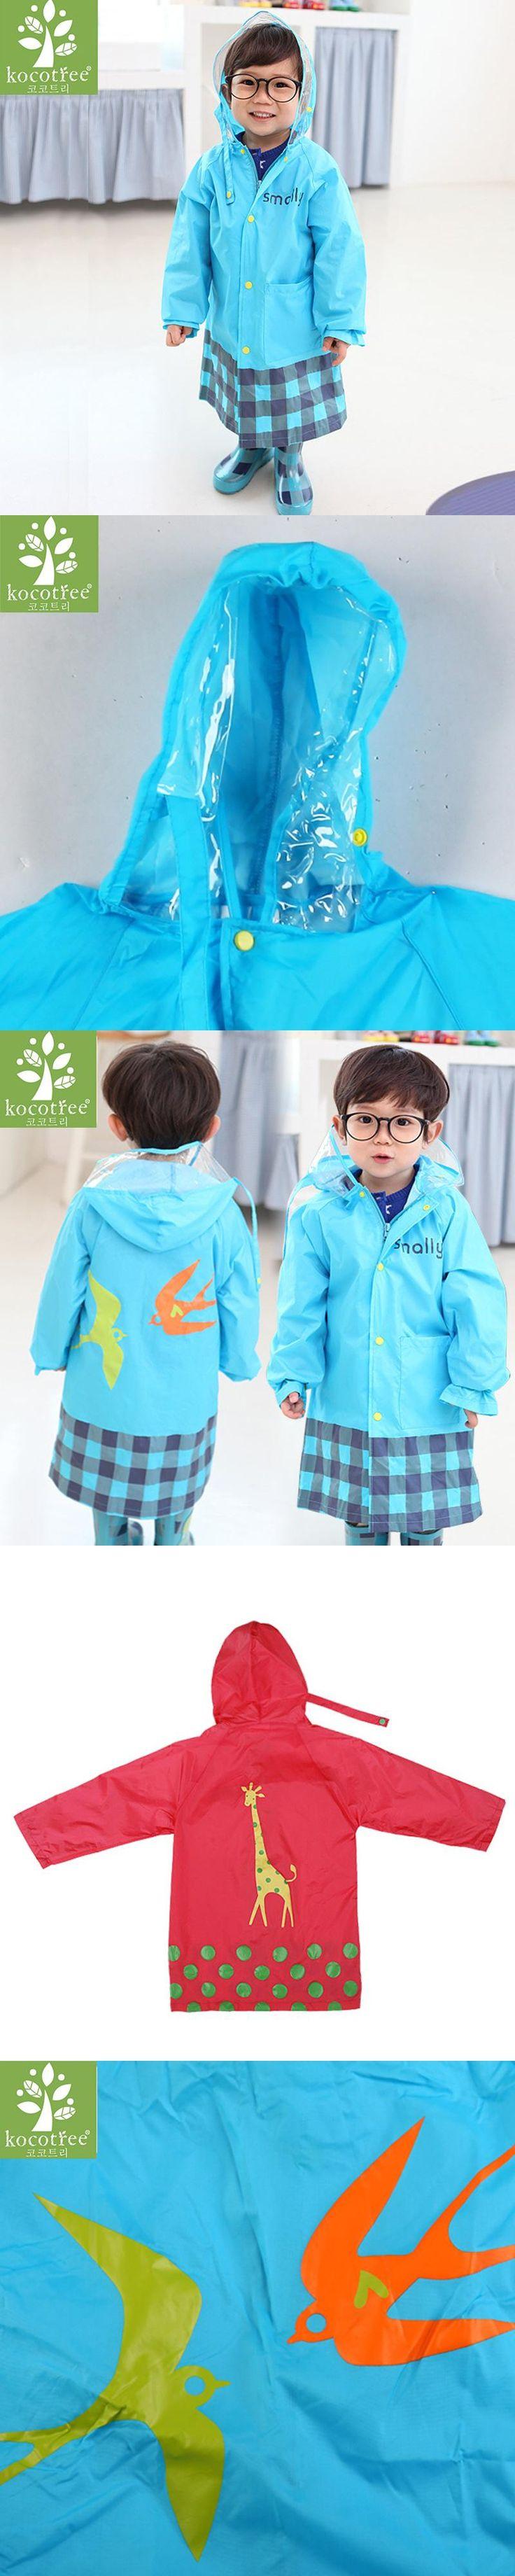 Best 25 Raincoats for kids ideas on Pinterest